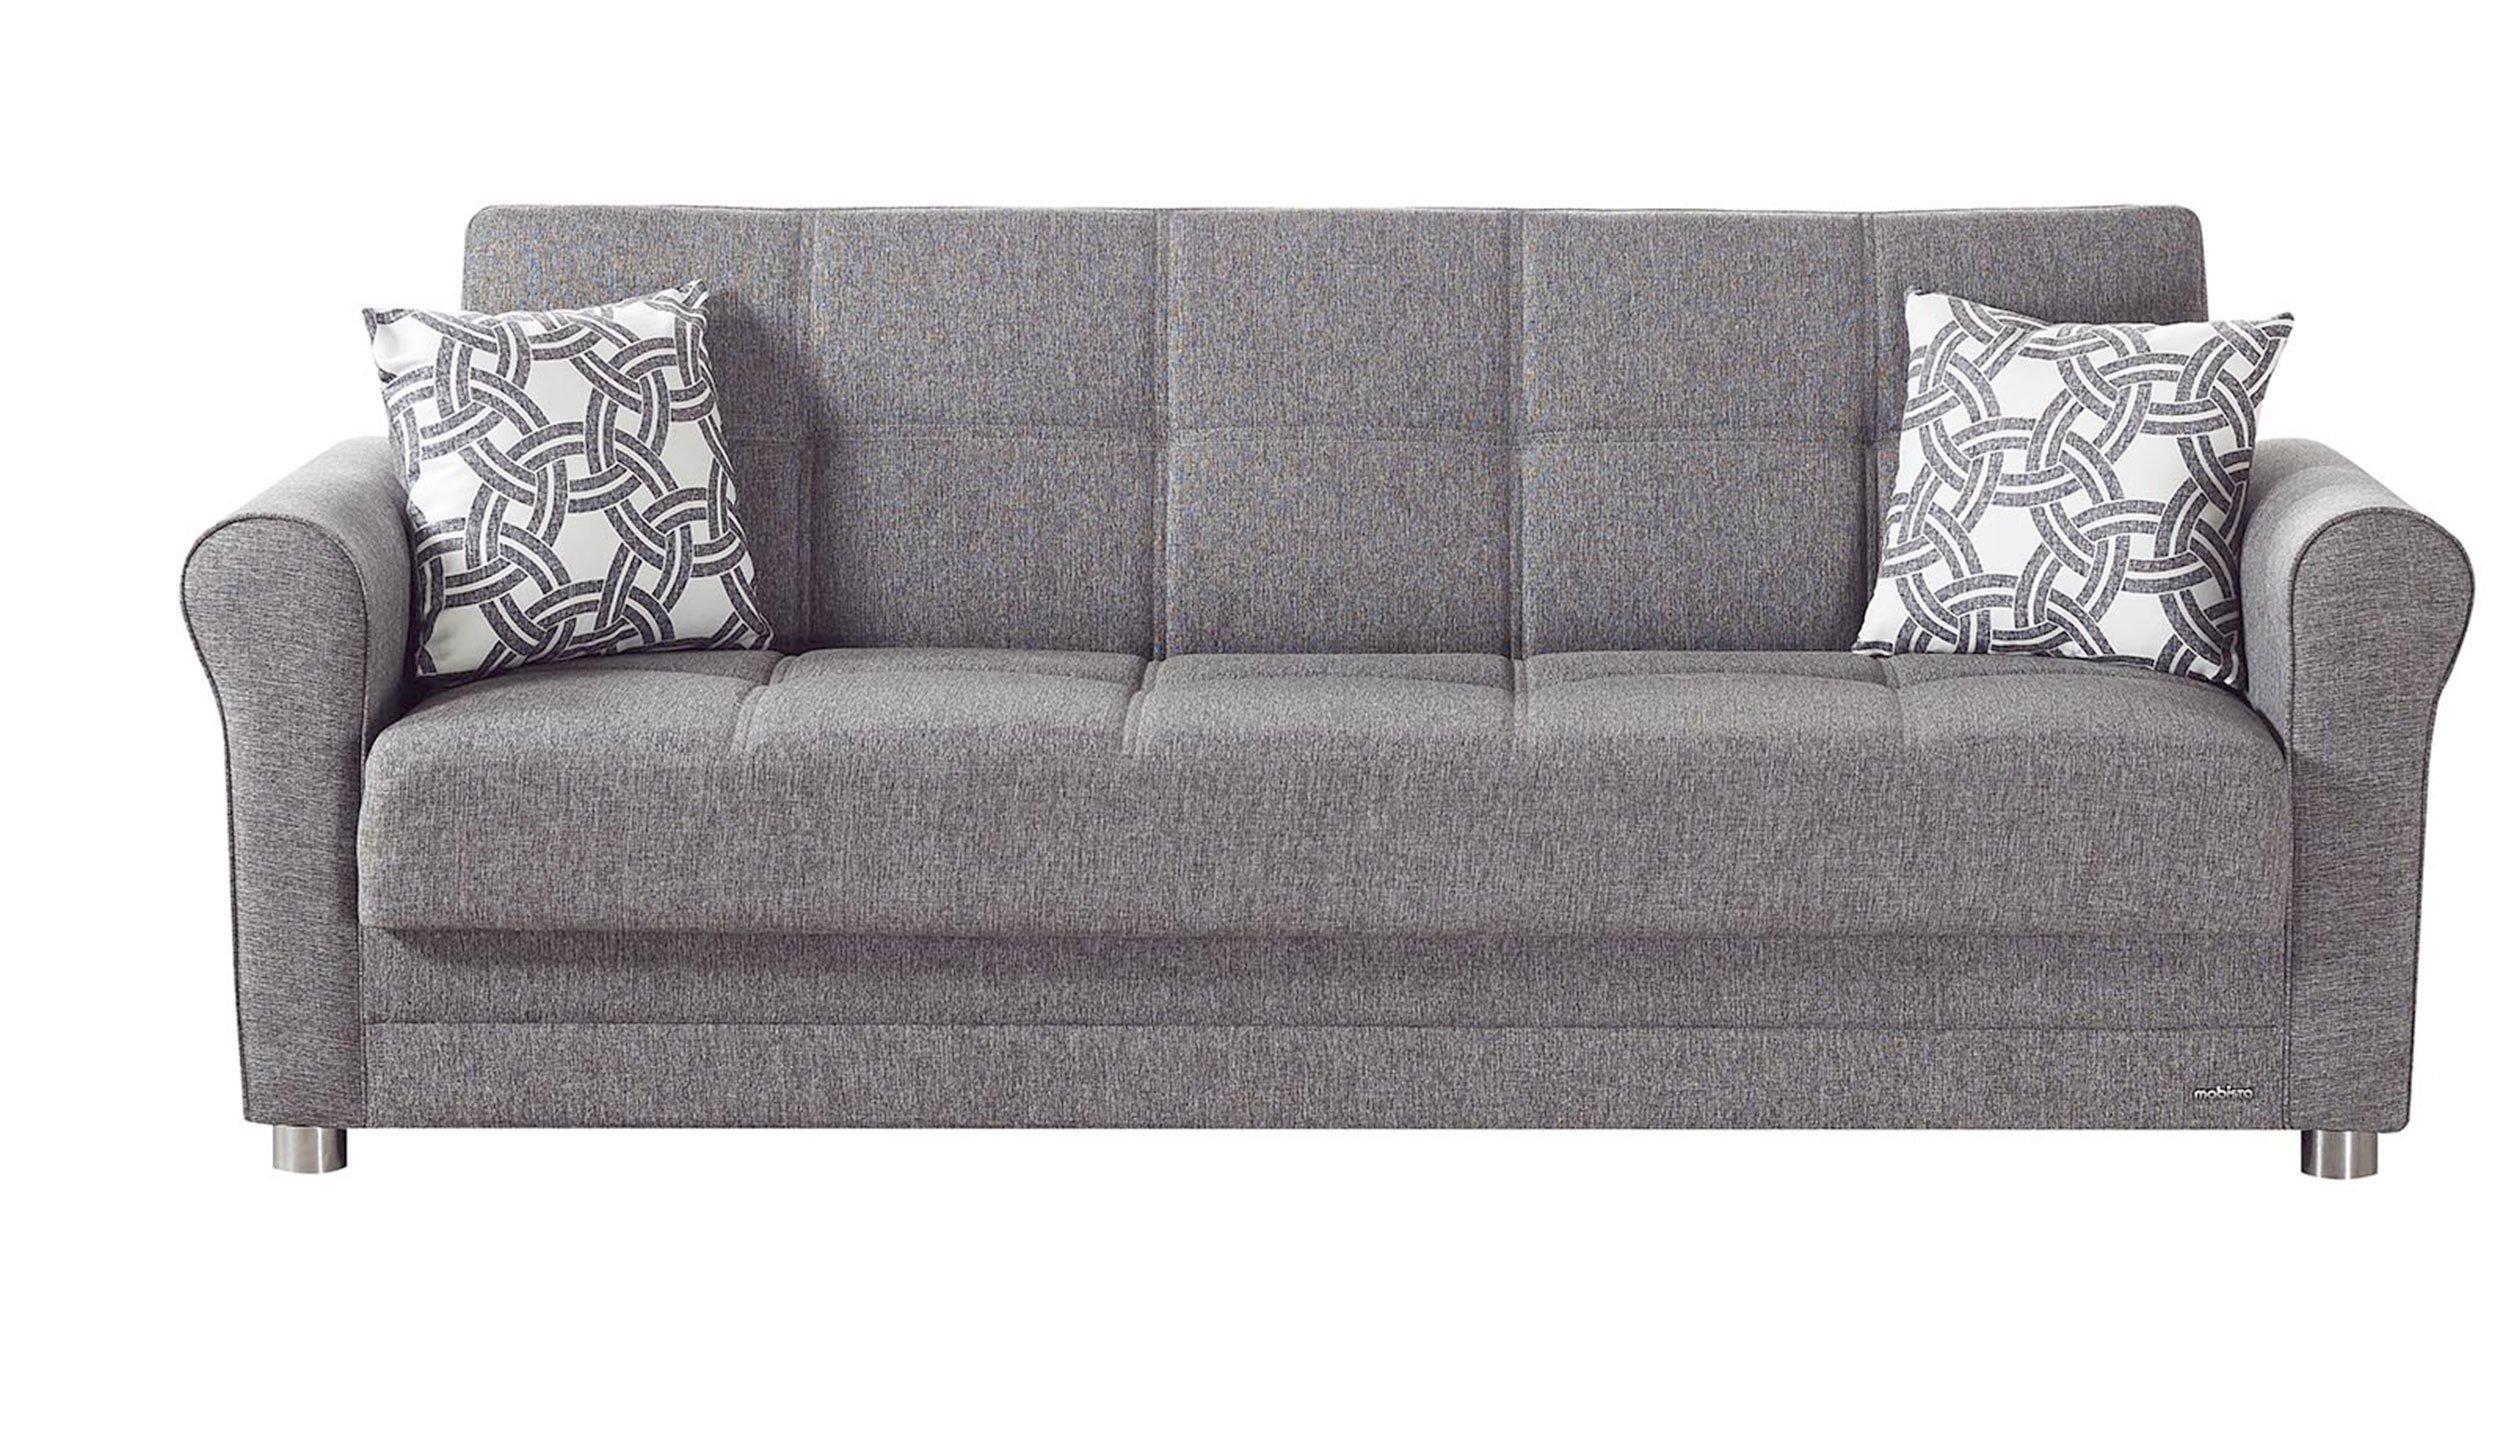 Divano Gray Sofa Bed by Mobista